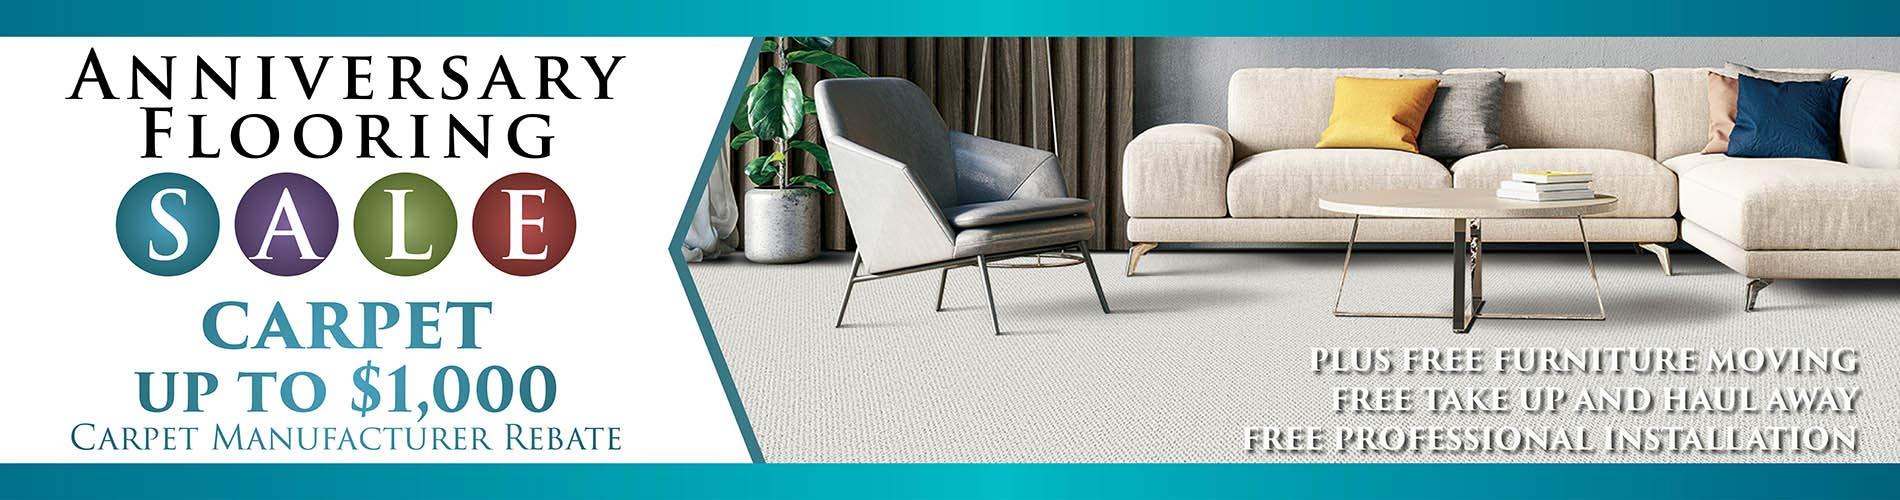 Carpet Up To $1000* carpet manufacturer rebate, FREE Furniture Moving • Take up of old carpet • Professional Installation • Interest Free Financing